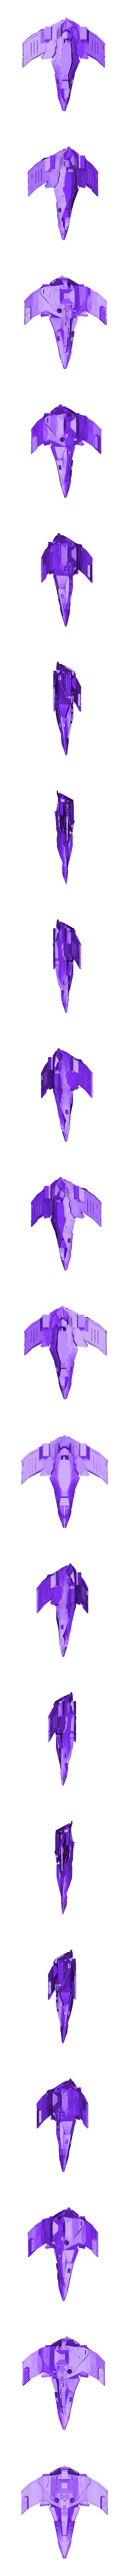 Eagle_Main_Body.stl Download free STL file Eagle Multi Colour/Material (Elite Dangerous) • 3D print object, Kahnindustries